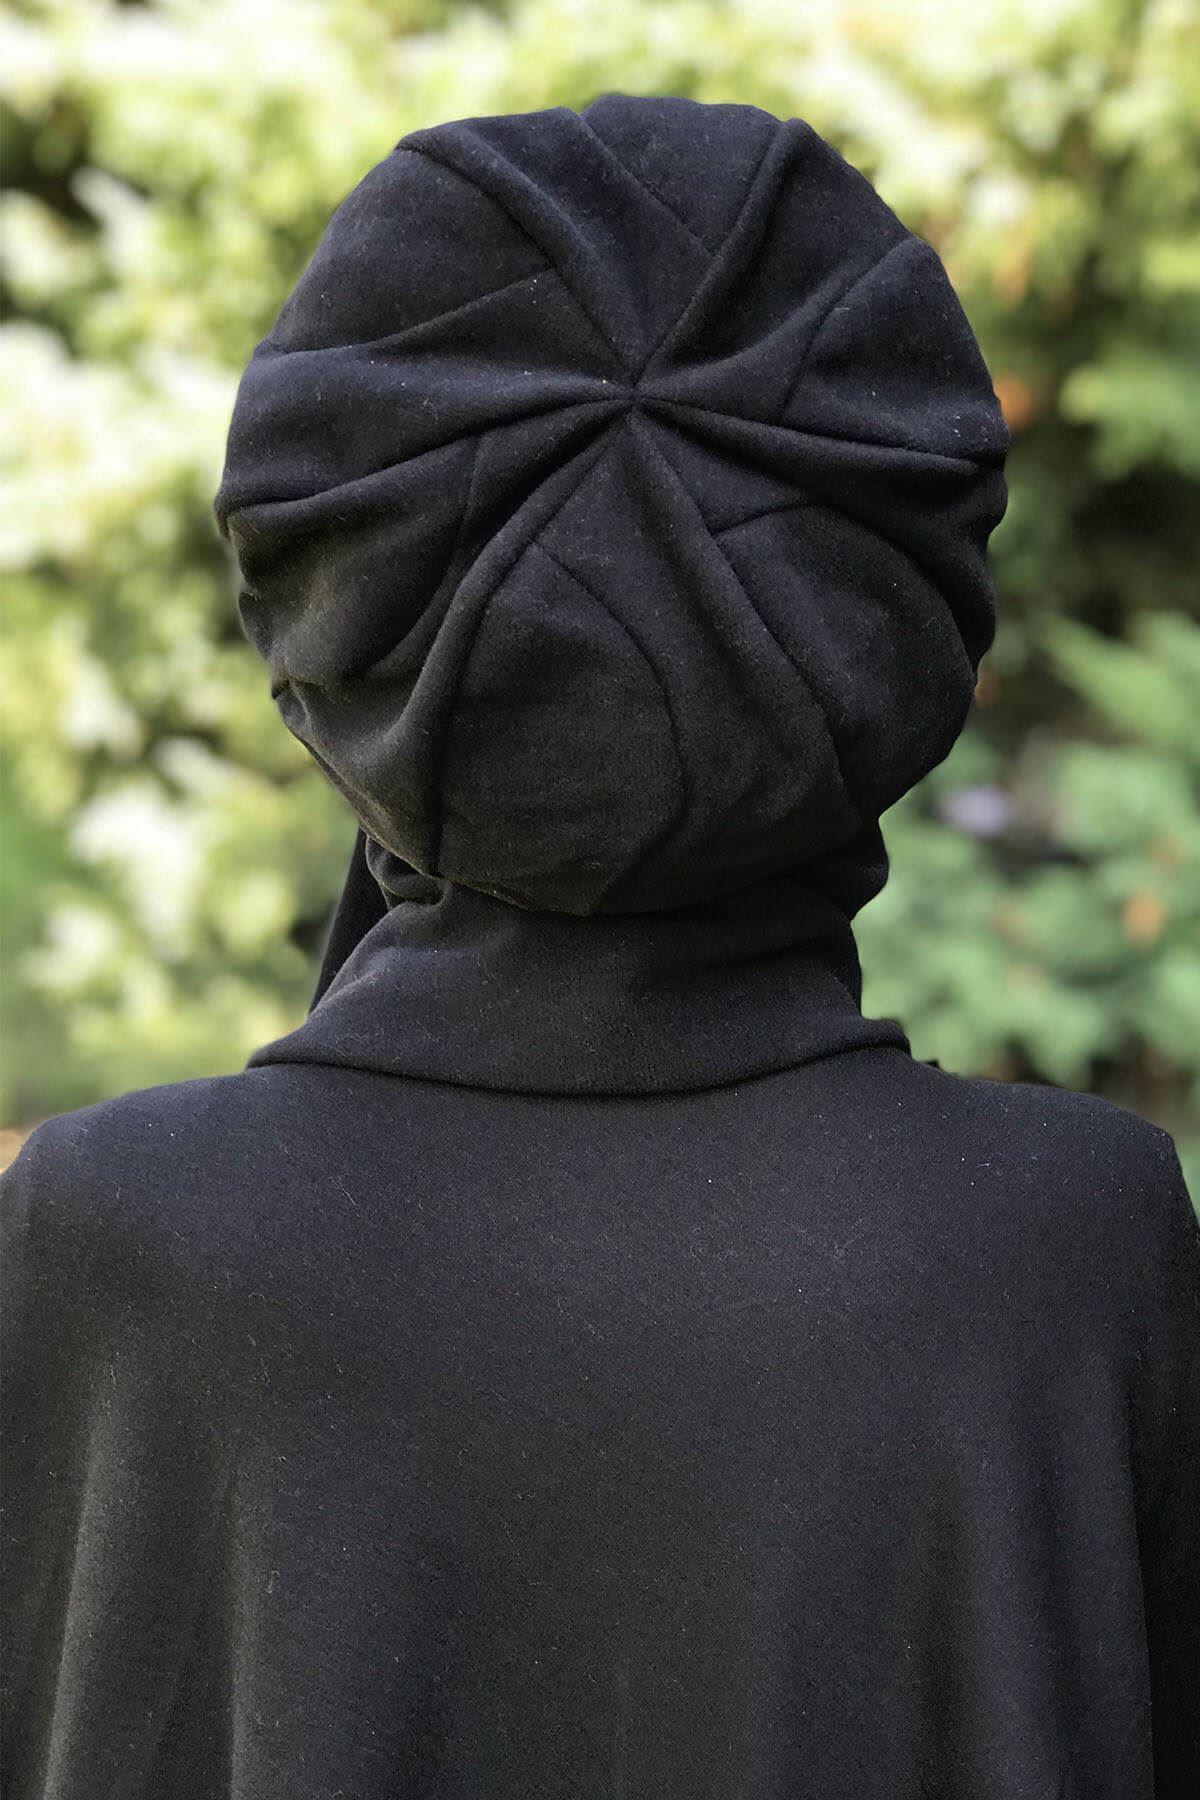 Siyah Panço& Siyah Elif Model Selanik Atkılı Bere Şal Kombin